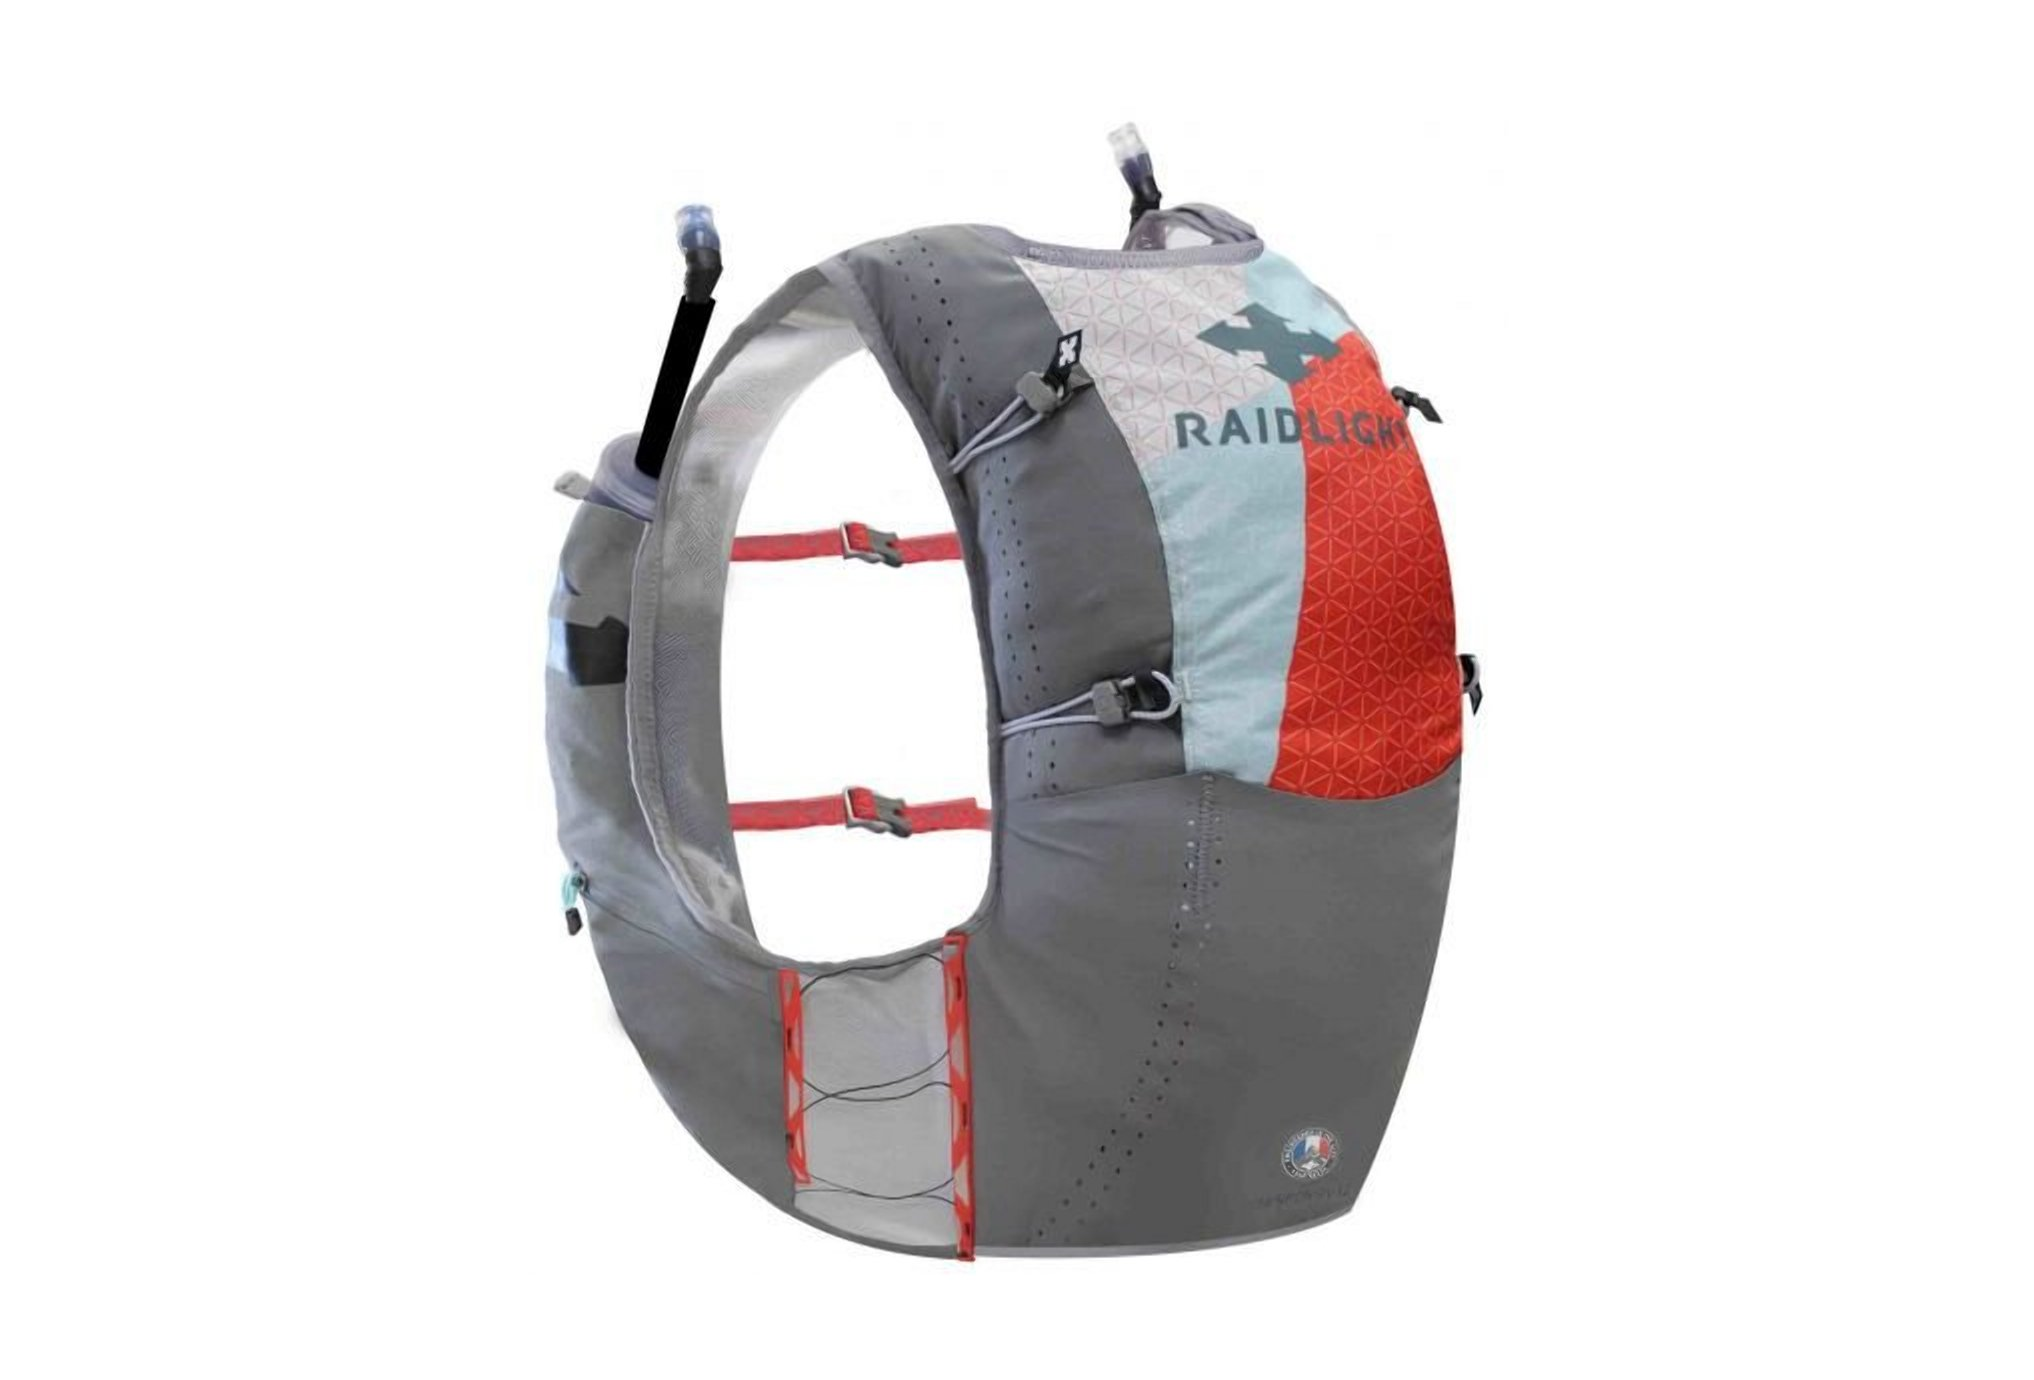 Raidlight Responsiv Vest 12L + 2 EazyFlask 600 mL M Sac hydratation / Gourde